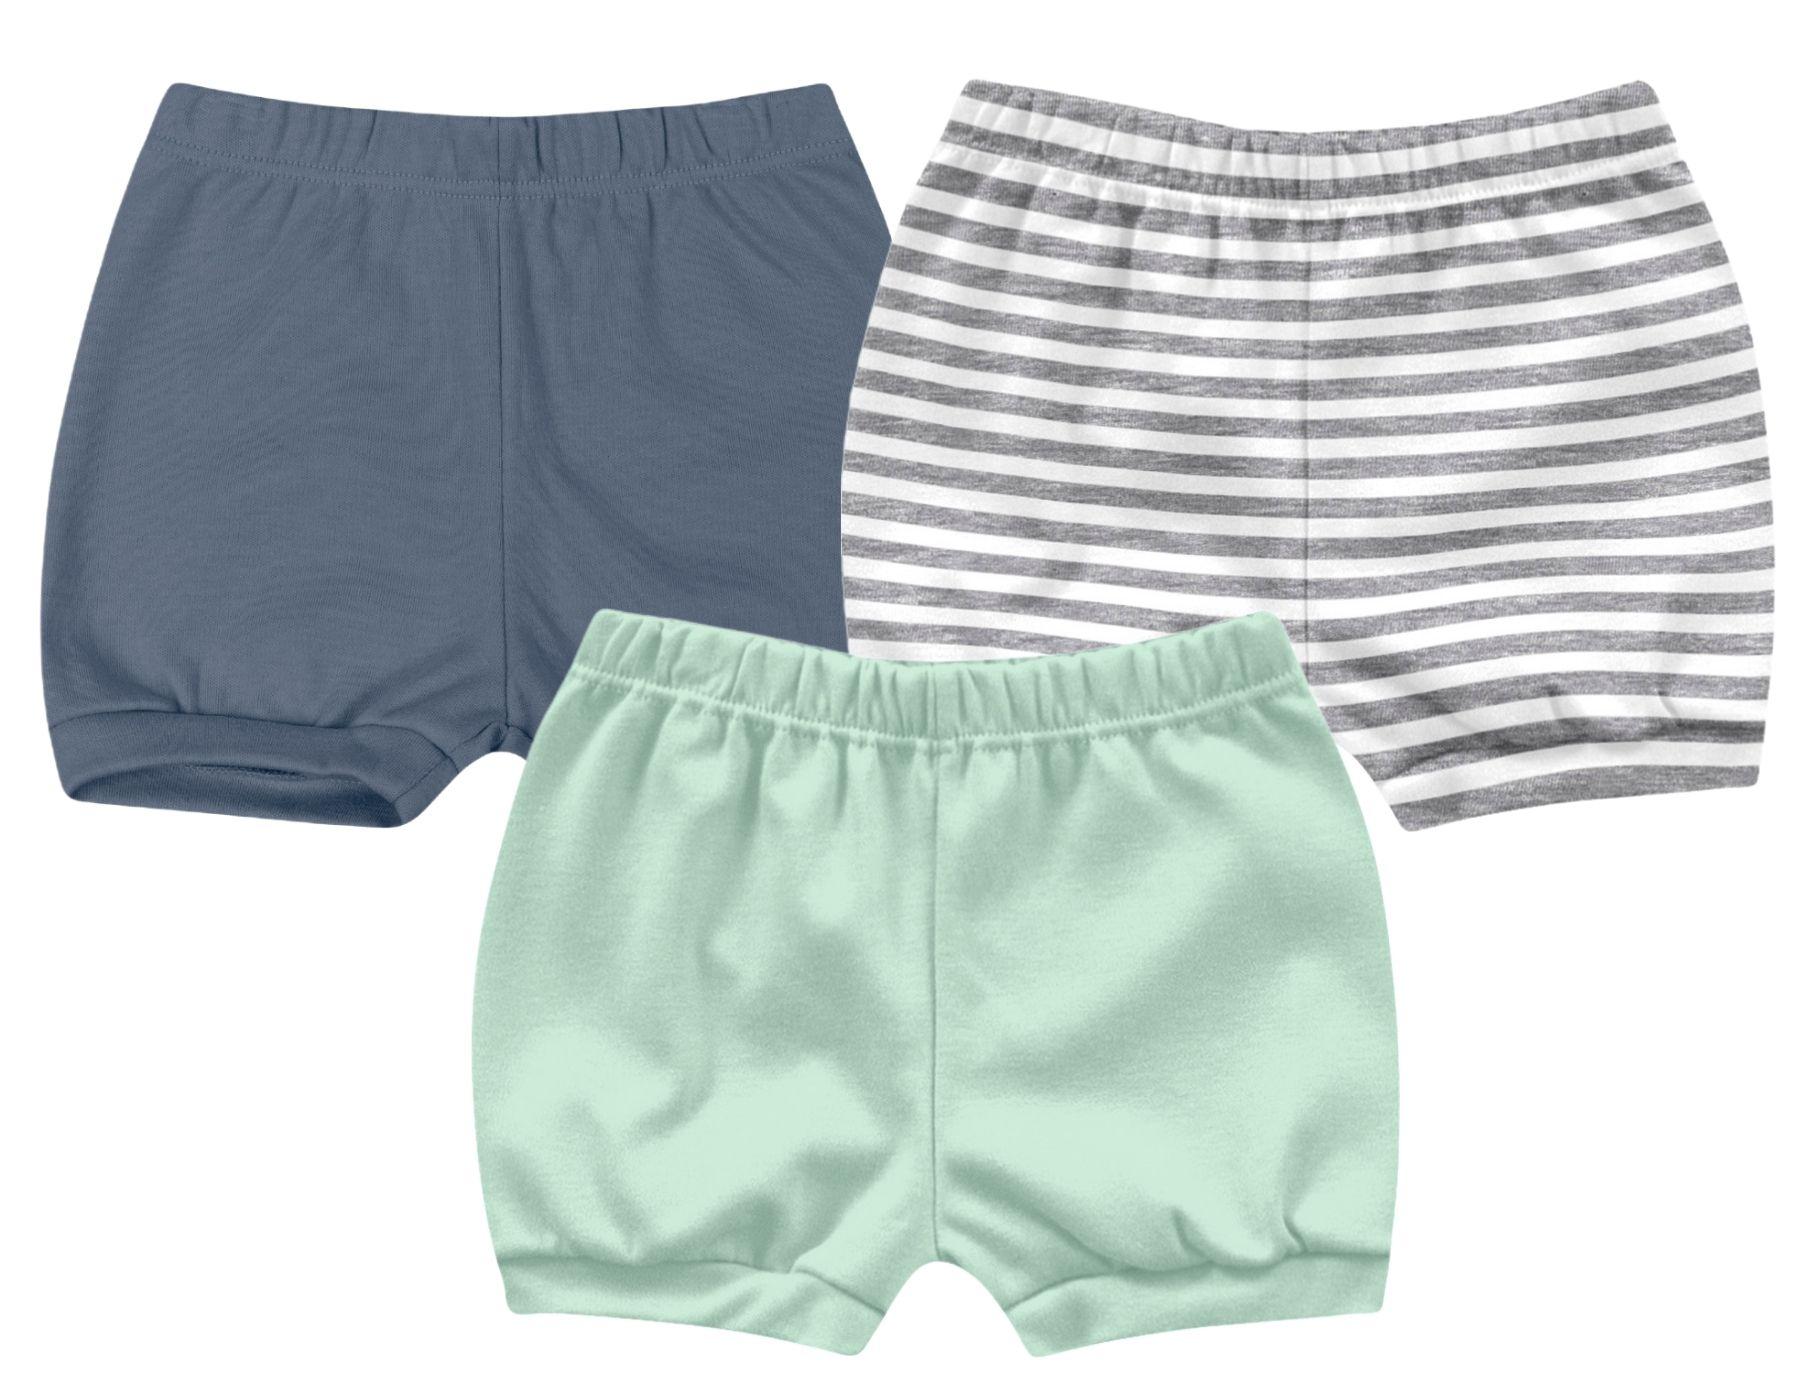 Kit Shorts Listrado e Lisinhos Kiko Baby